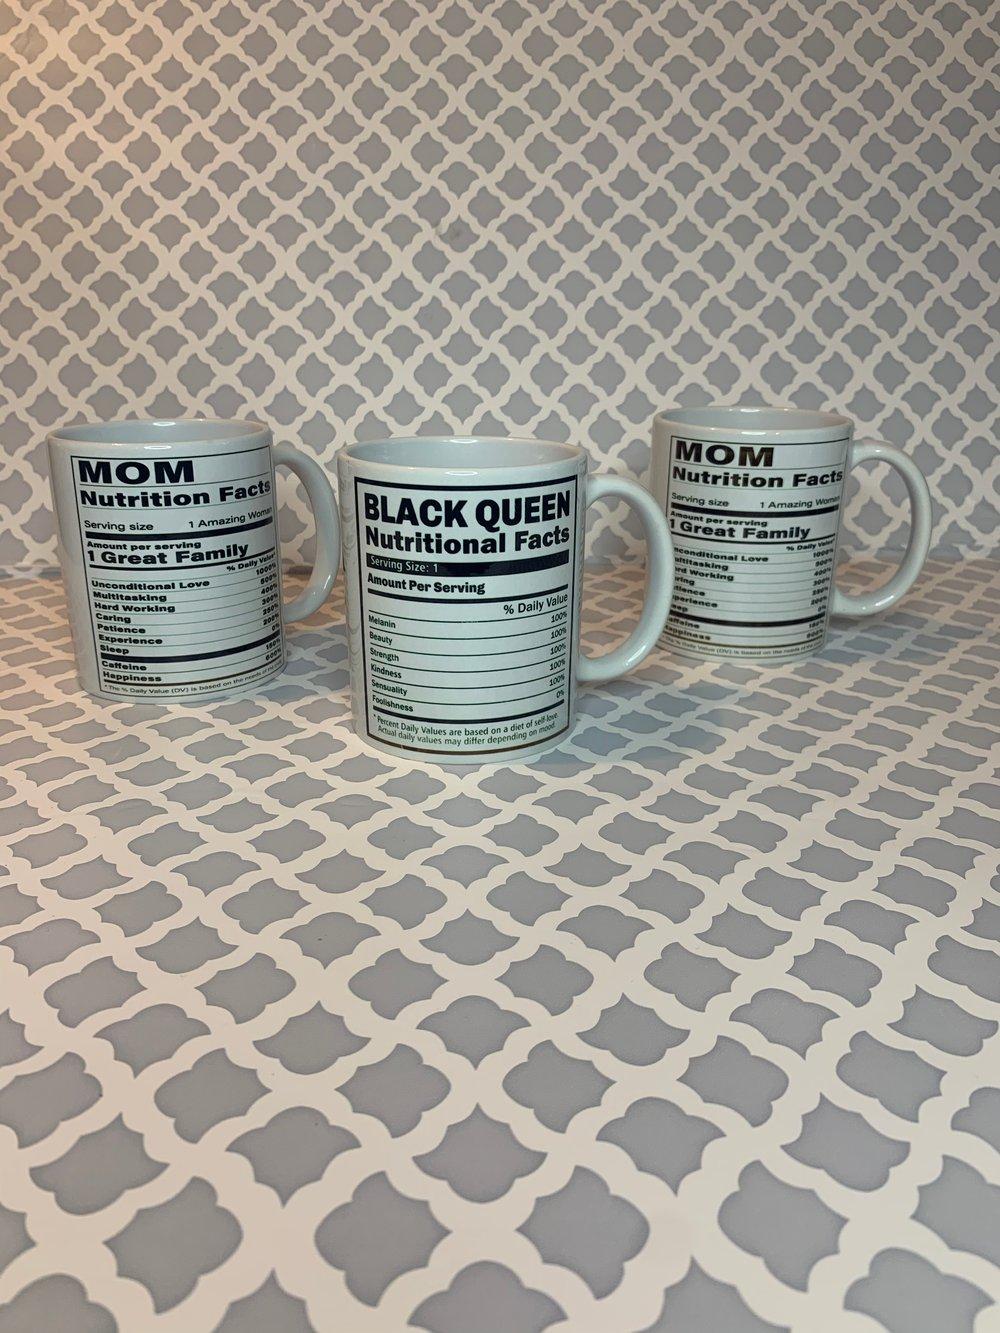 Image of Just my type mug